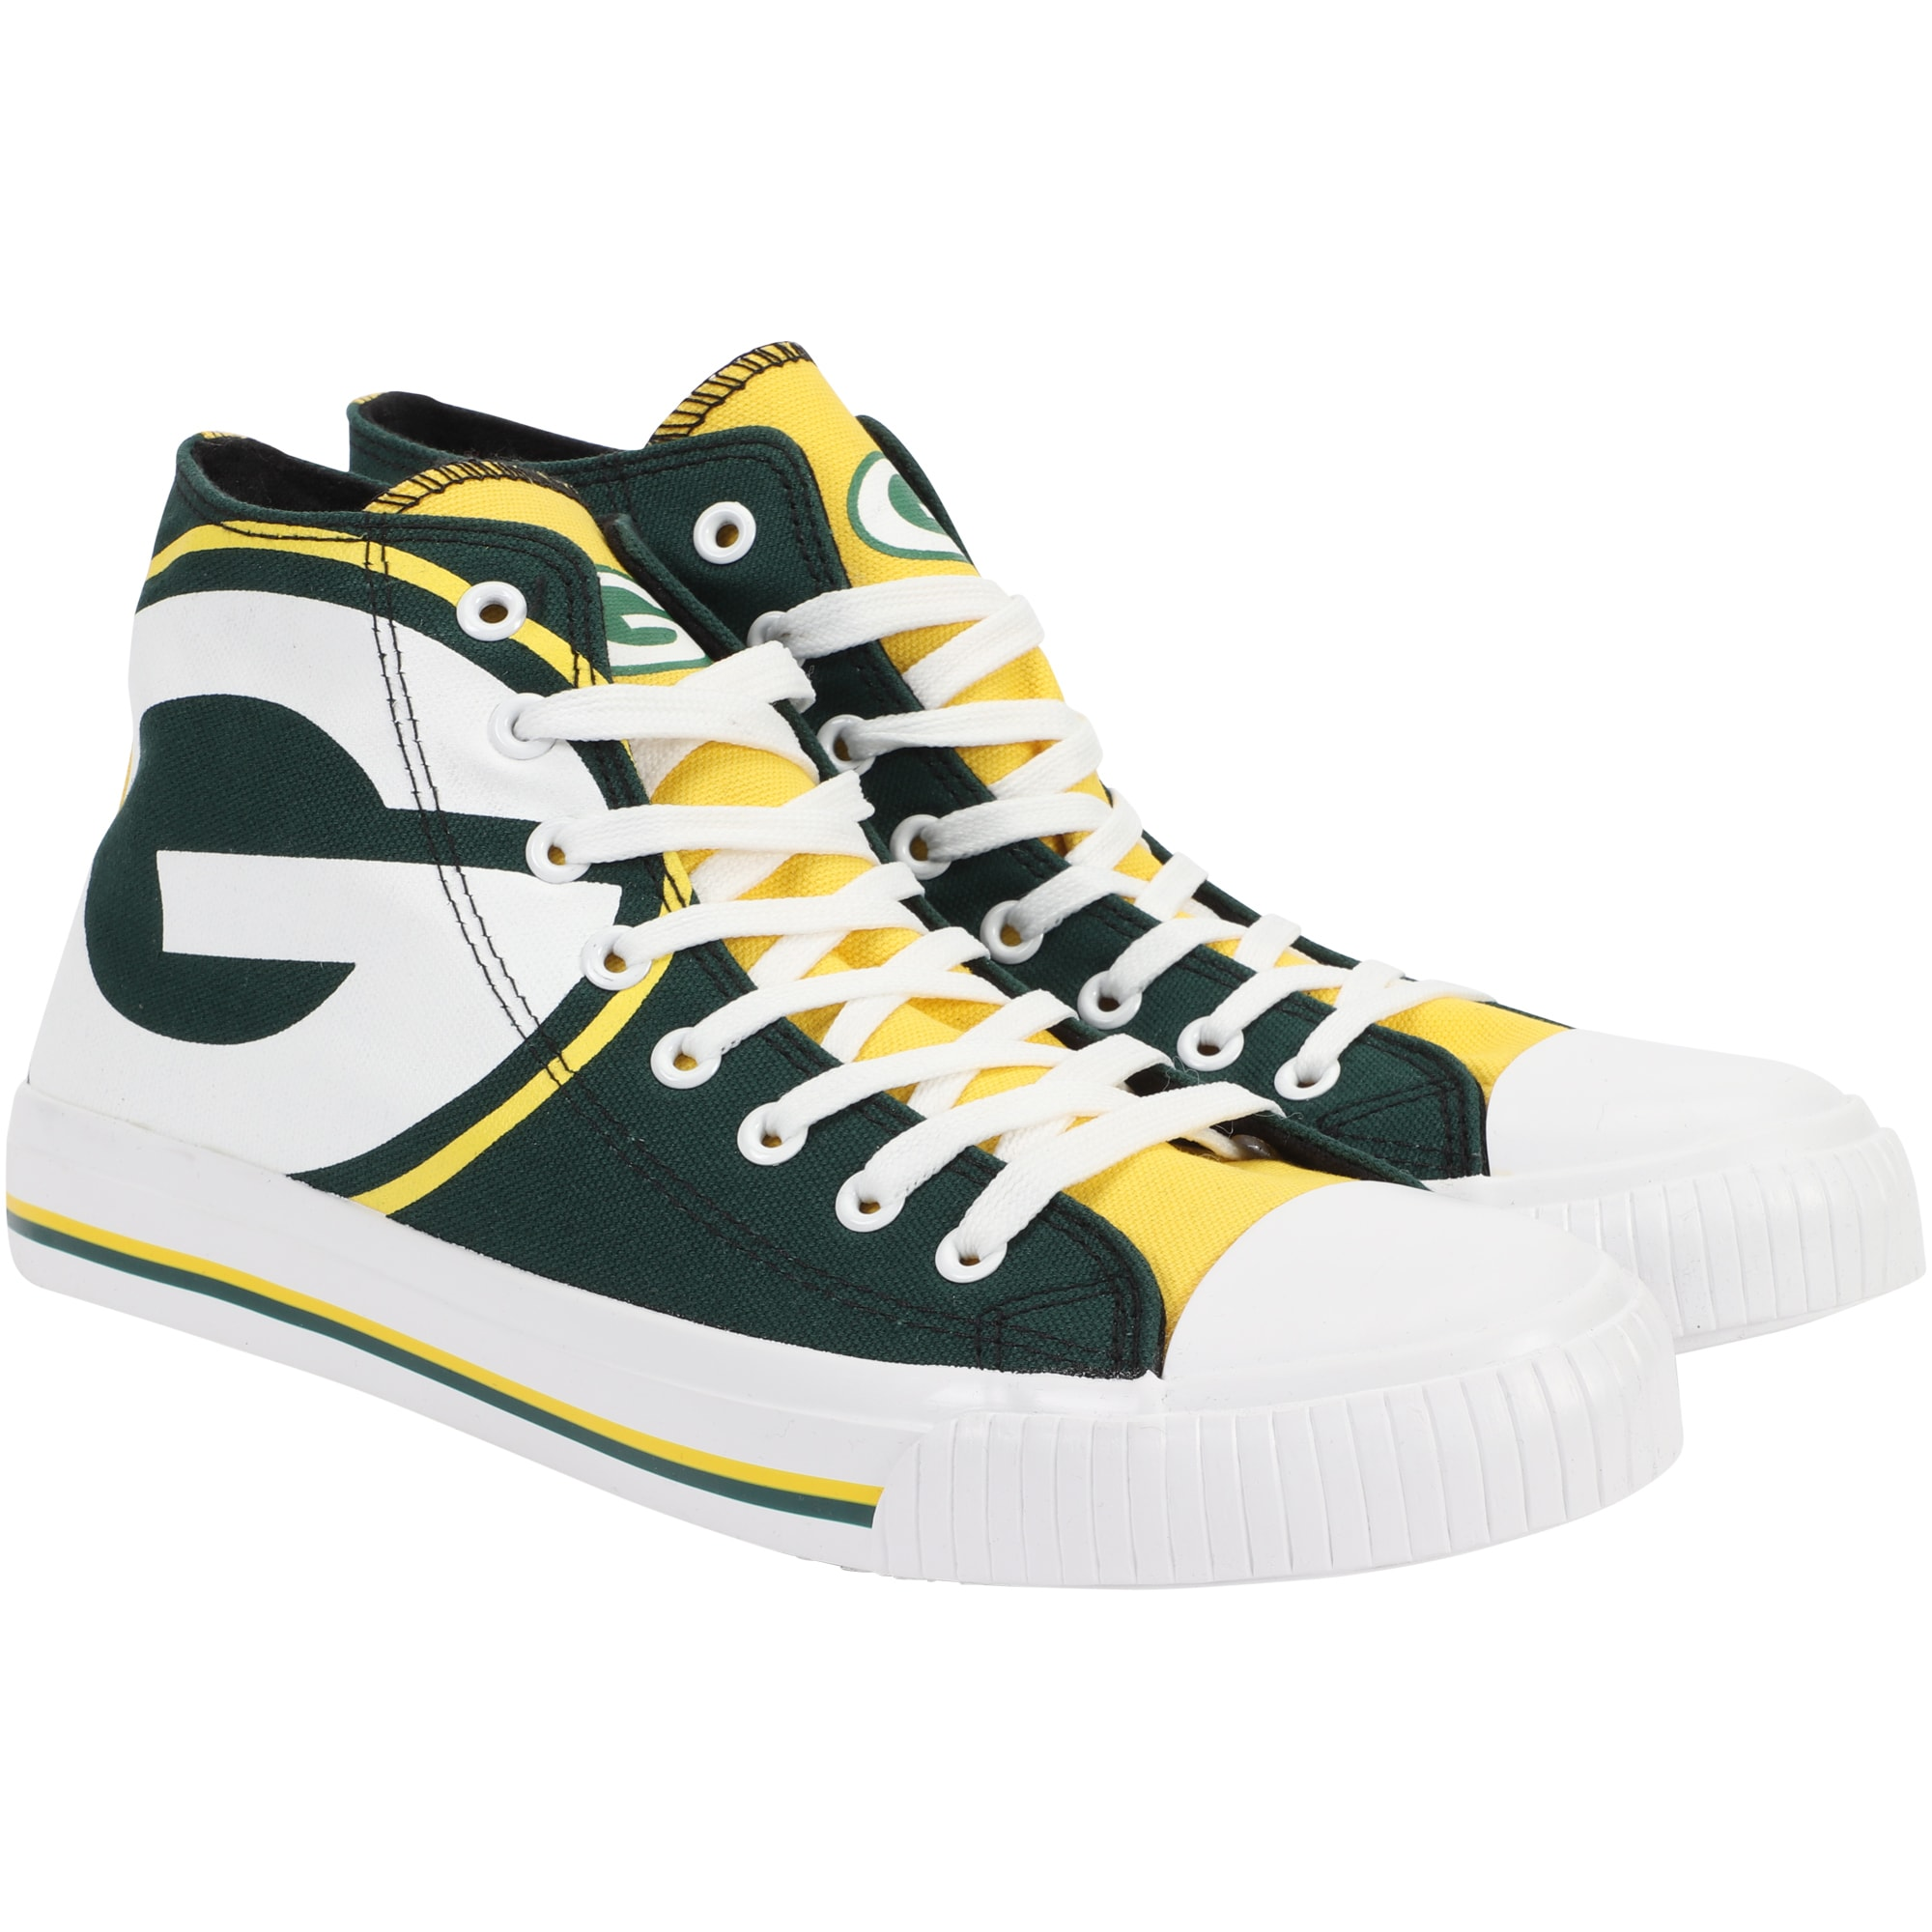 Green Bay Packers Big Logo High Top Sneakers